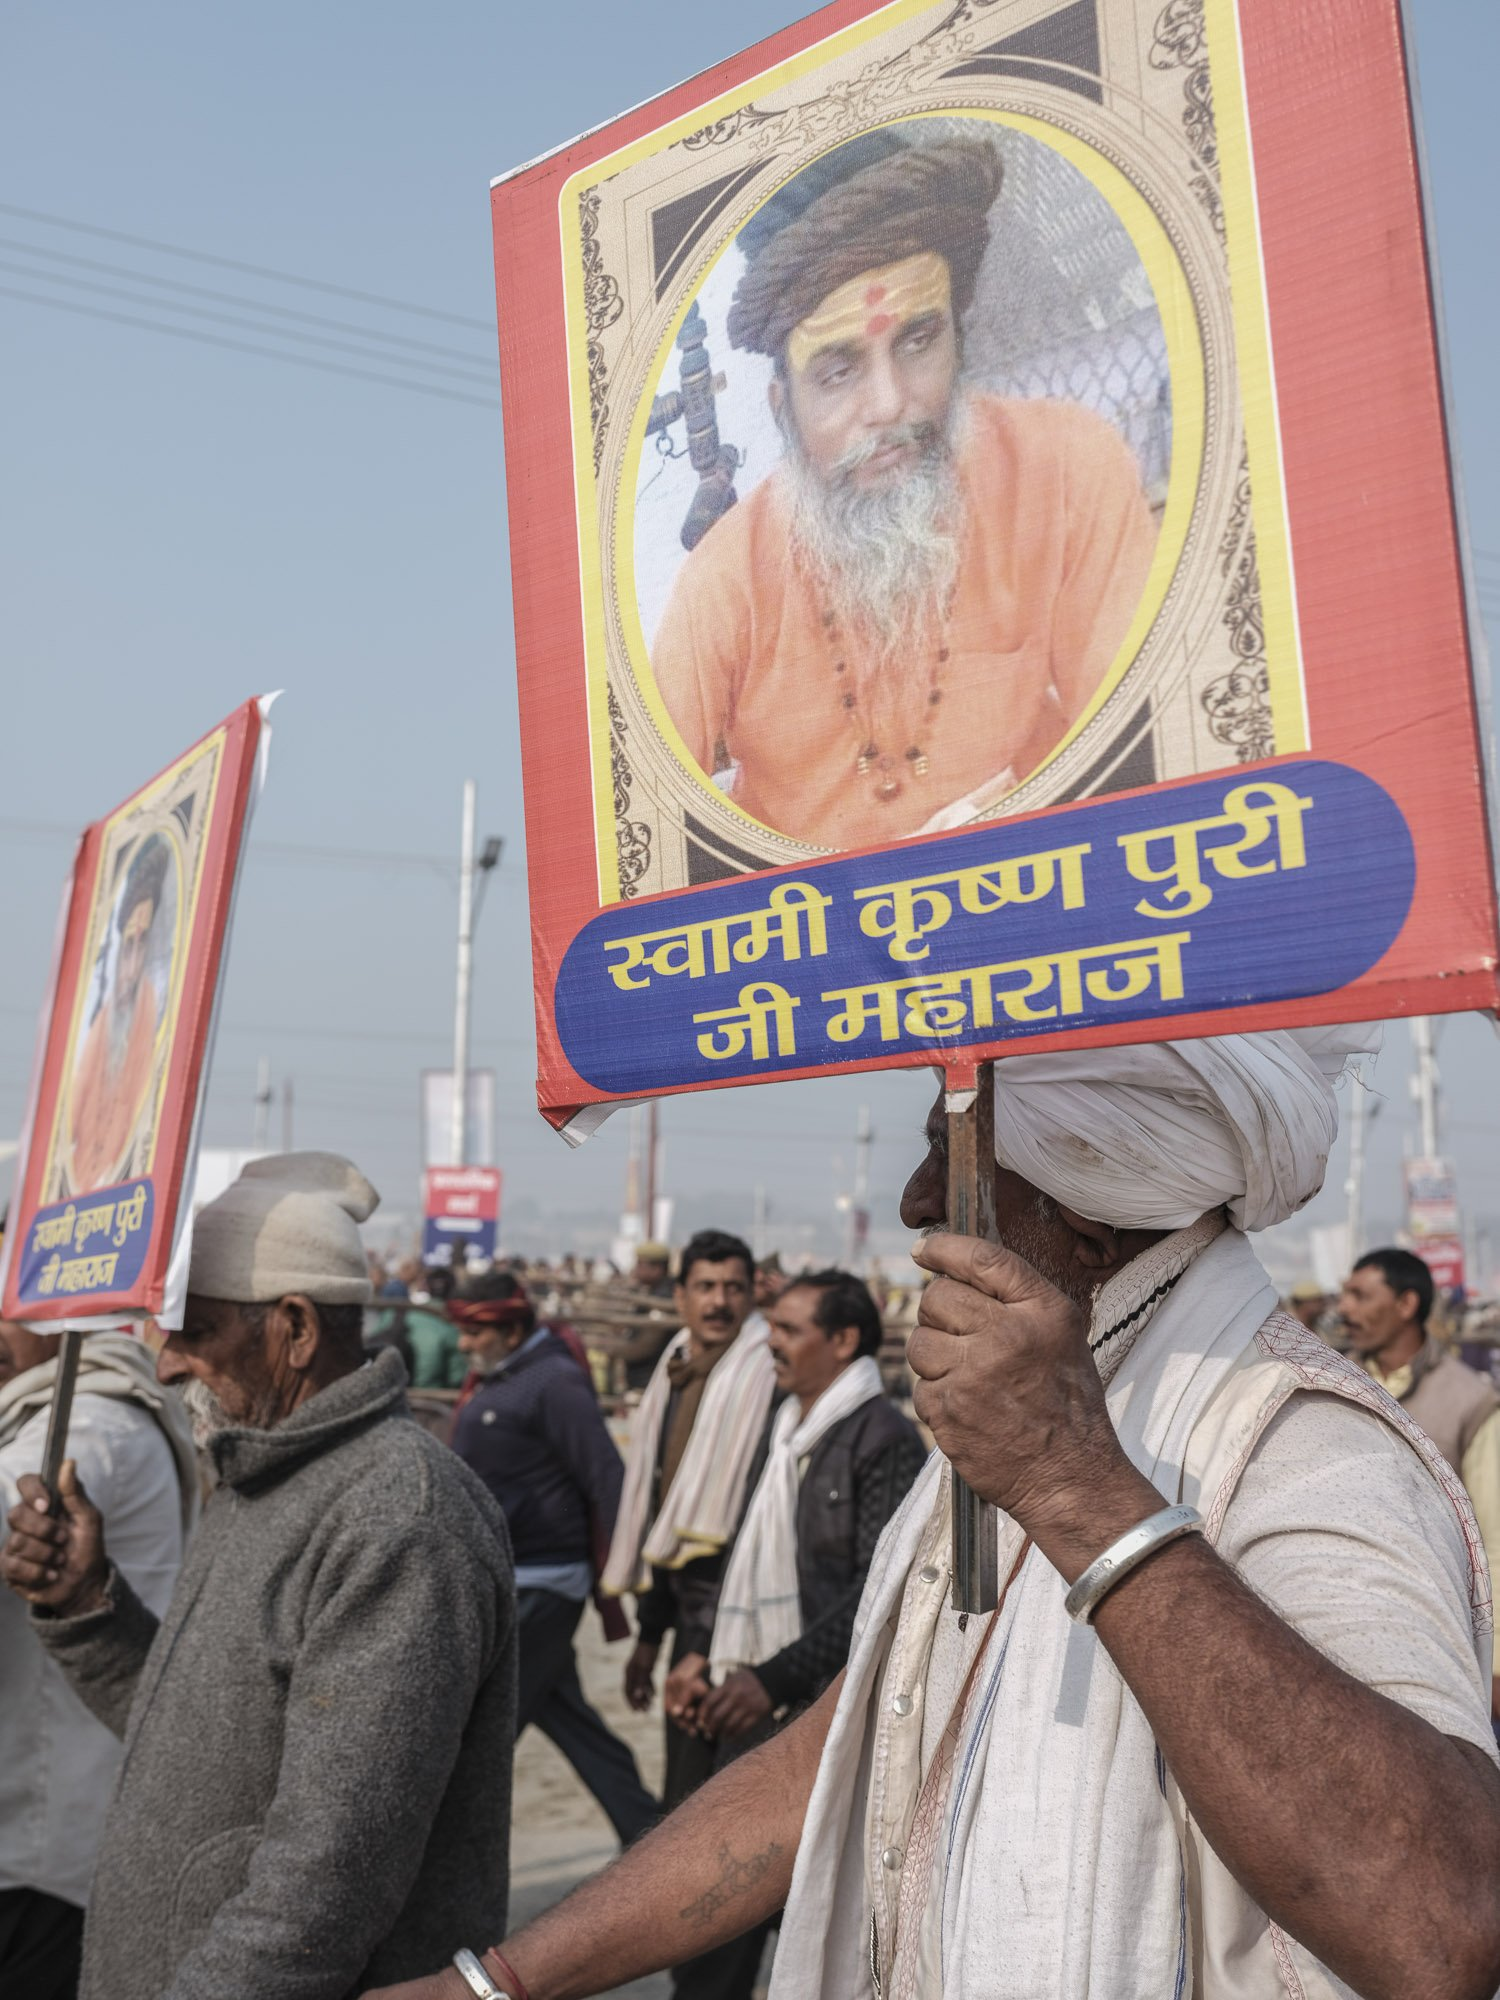 baba picture print crowd 4 February pilgrims Kumbh mela 2019 India Allahabad Prayagraj Ardh hindu religious Festival event rivers photographer jose jeuland photography